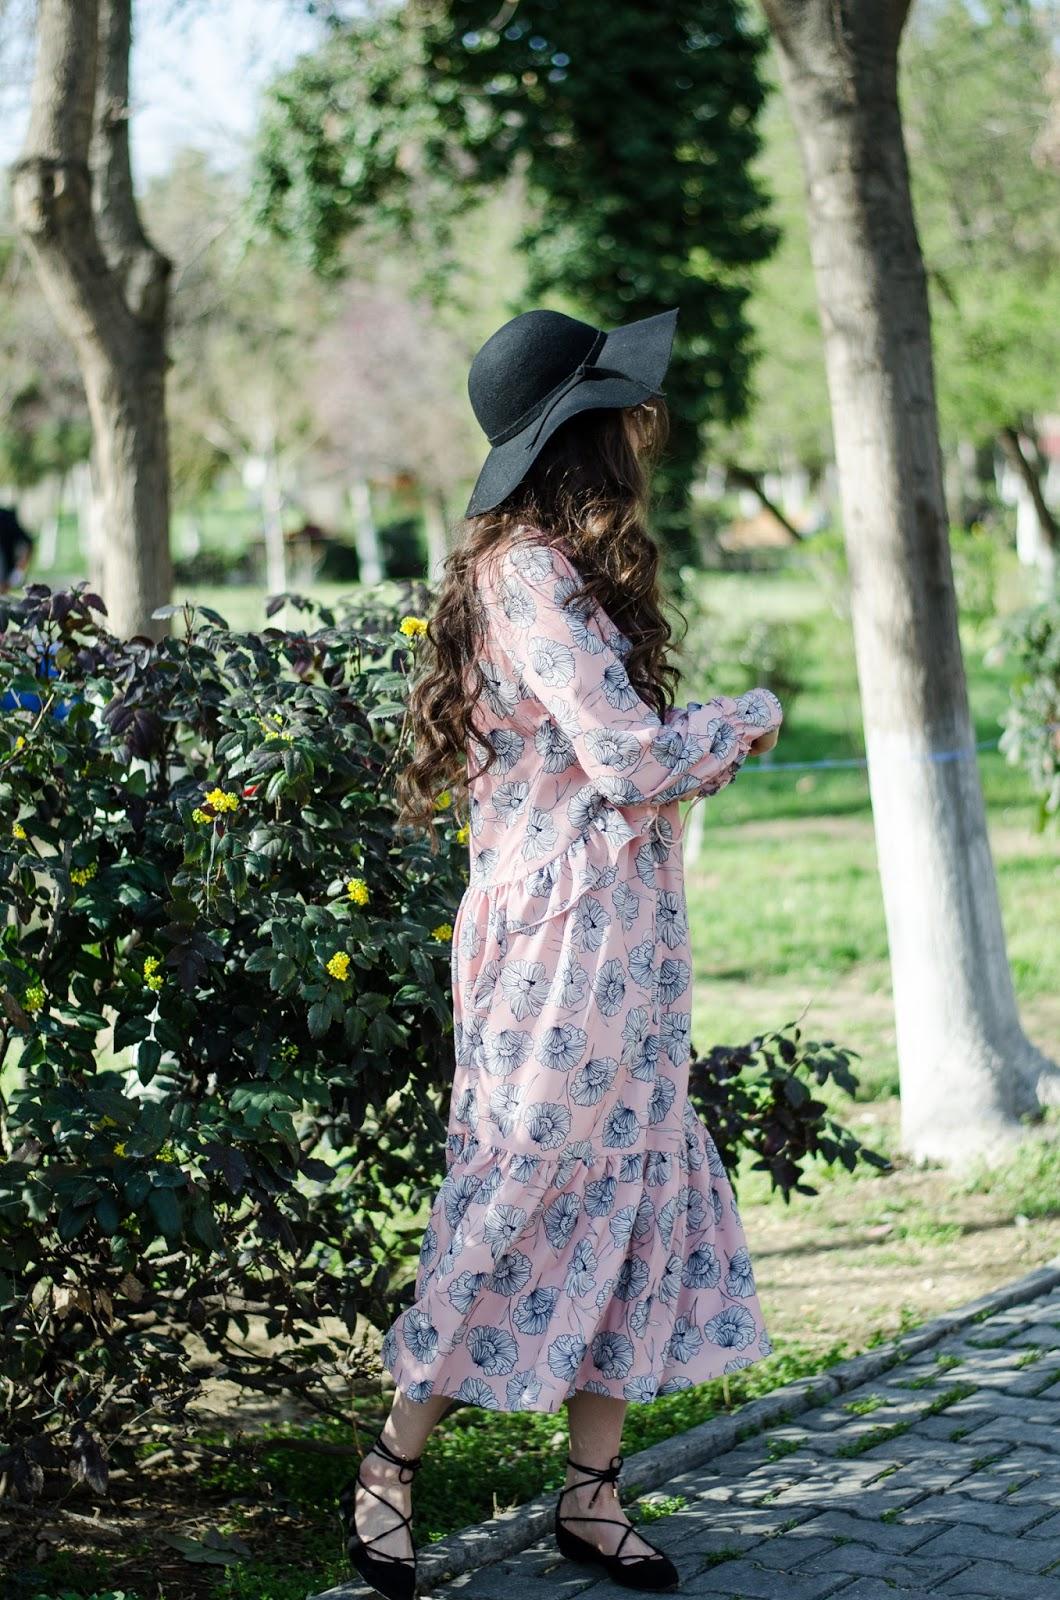 fashion blogger diyorasnotes diyora beta boho chic midi pink dress printed dress lace sandals hat oversized sunglasses